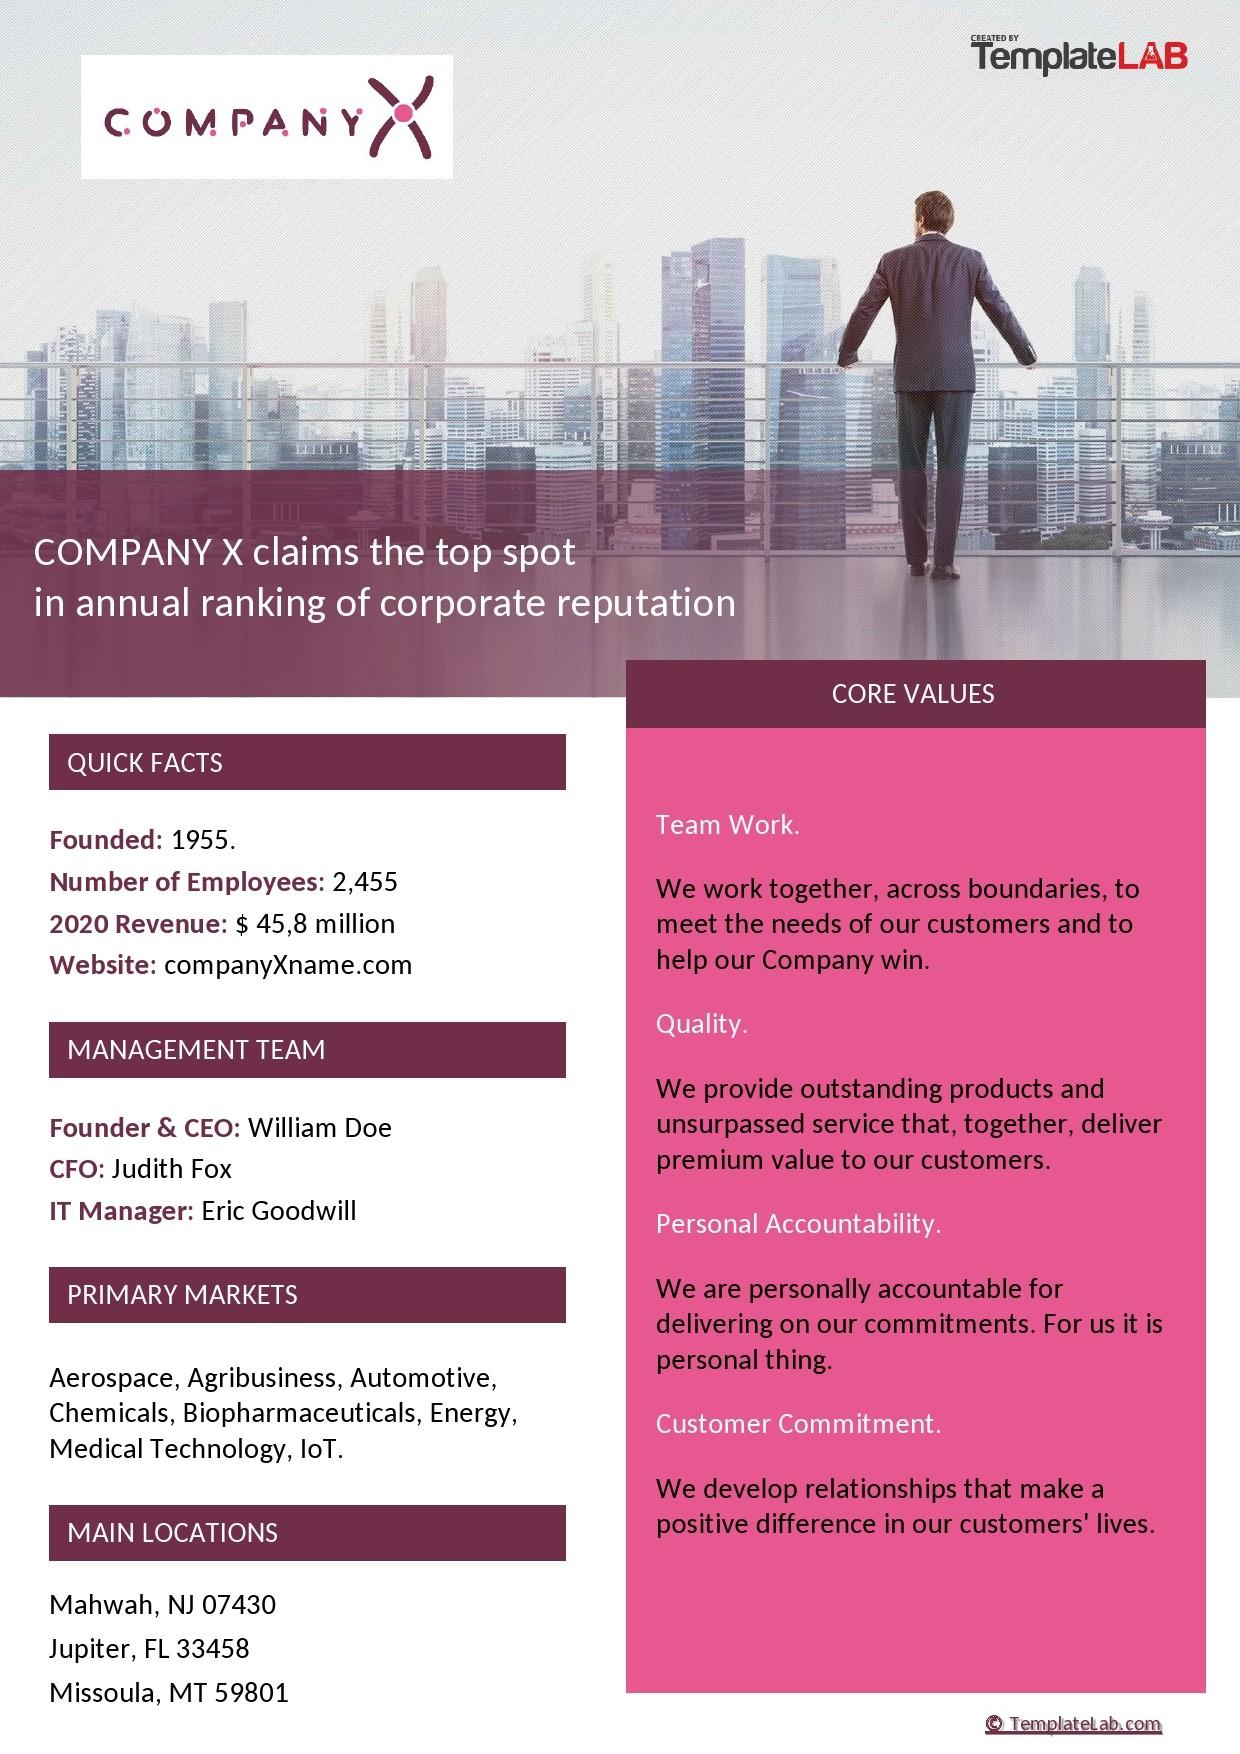 Free Company Fact Sheet Template - TemplateLab.com